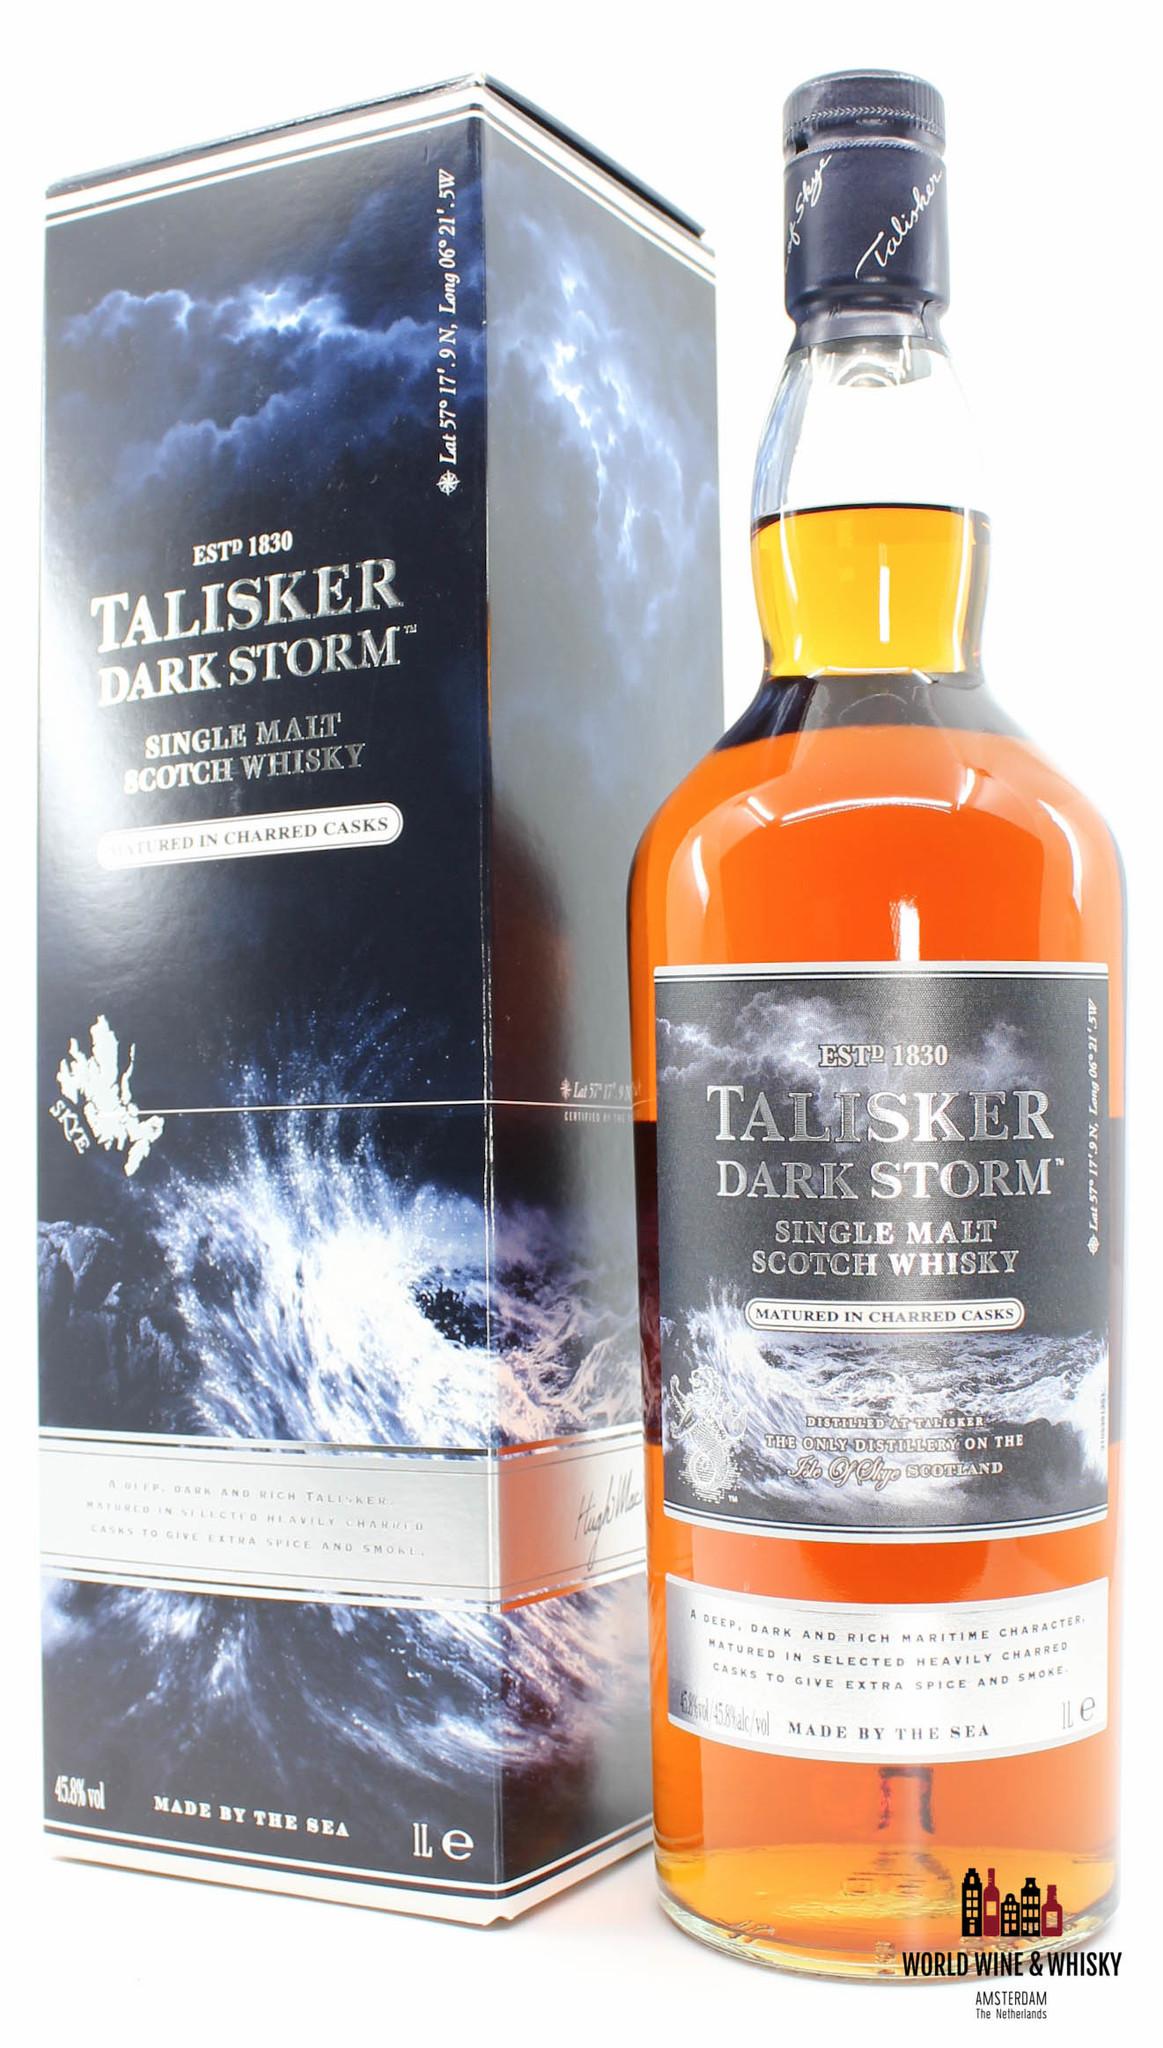 Talisker Talisker Dark Storm 2014 - Travel Retail Exclusive  45.8% 1 Litre (1000 ml)